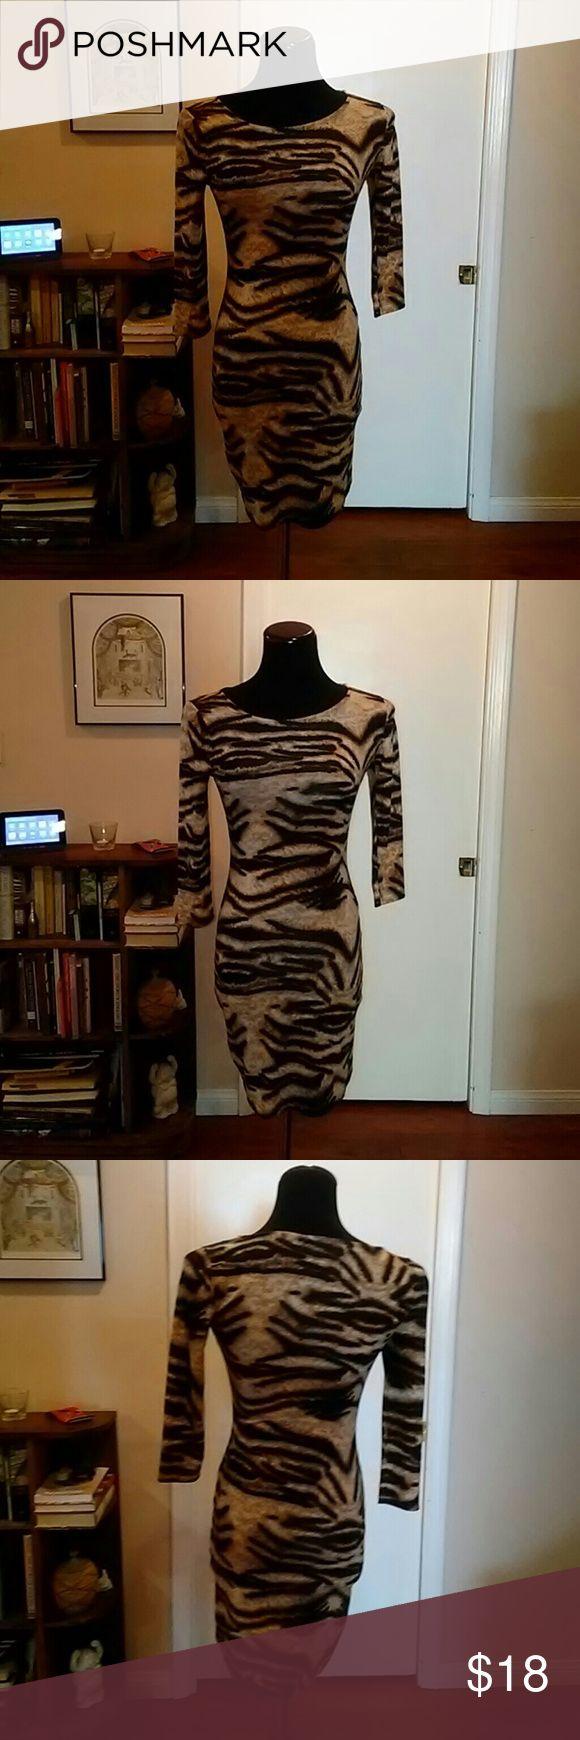 Animal Print Mini Dress Sexy Animal Print dress with scoop neck. Forever 21 Dresses Mini